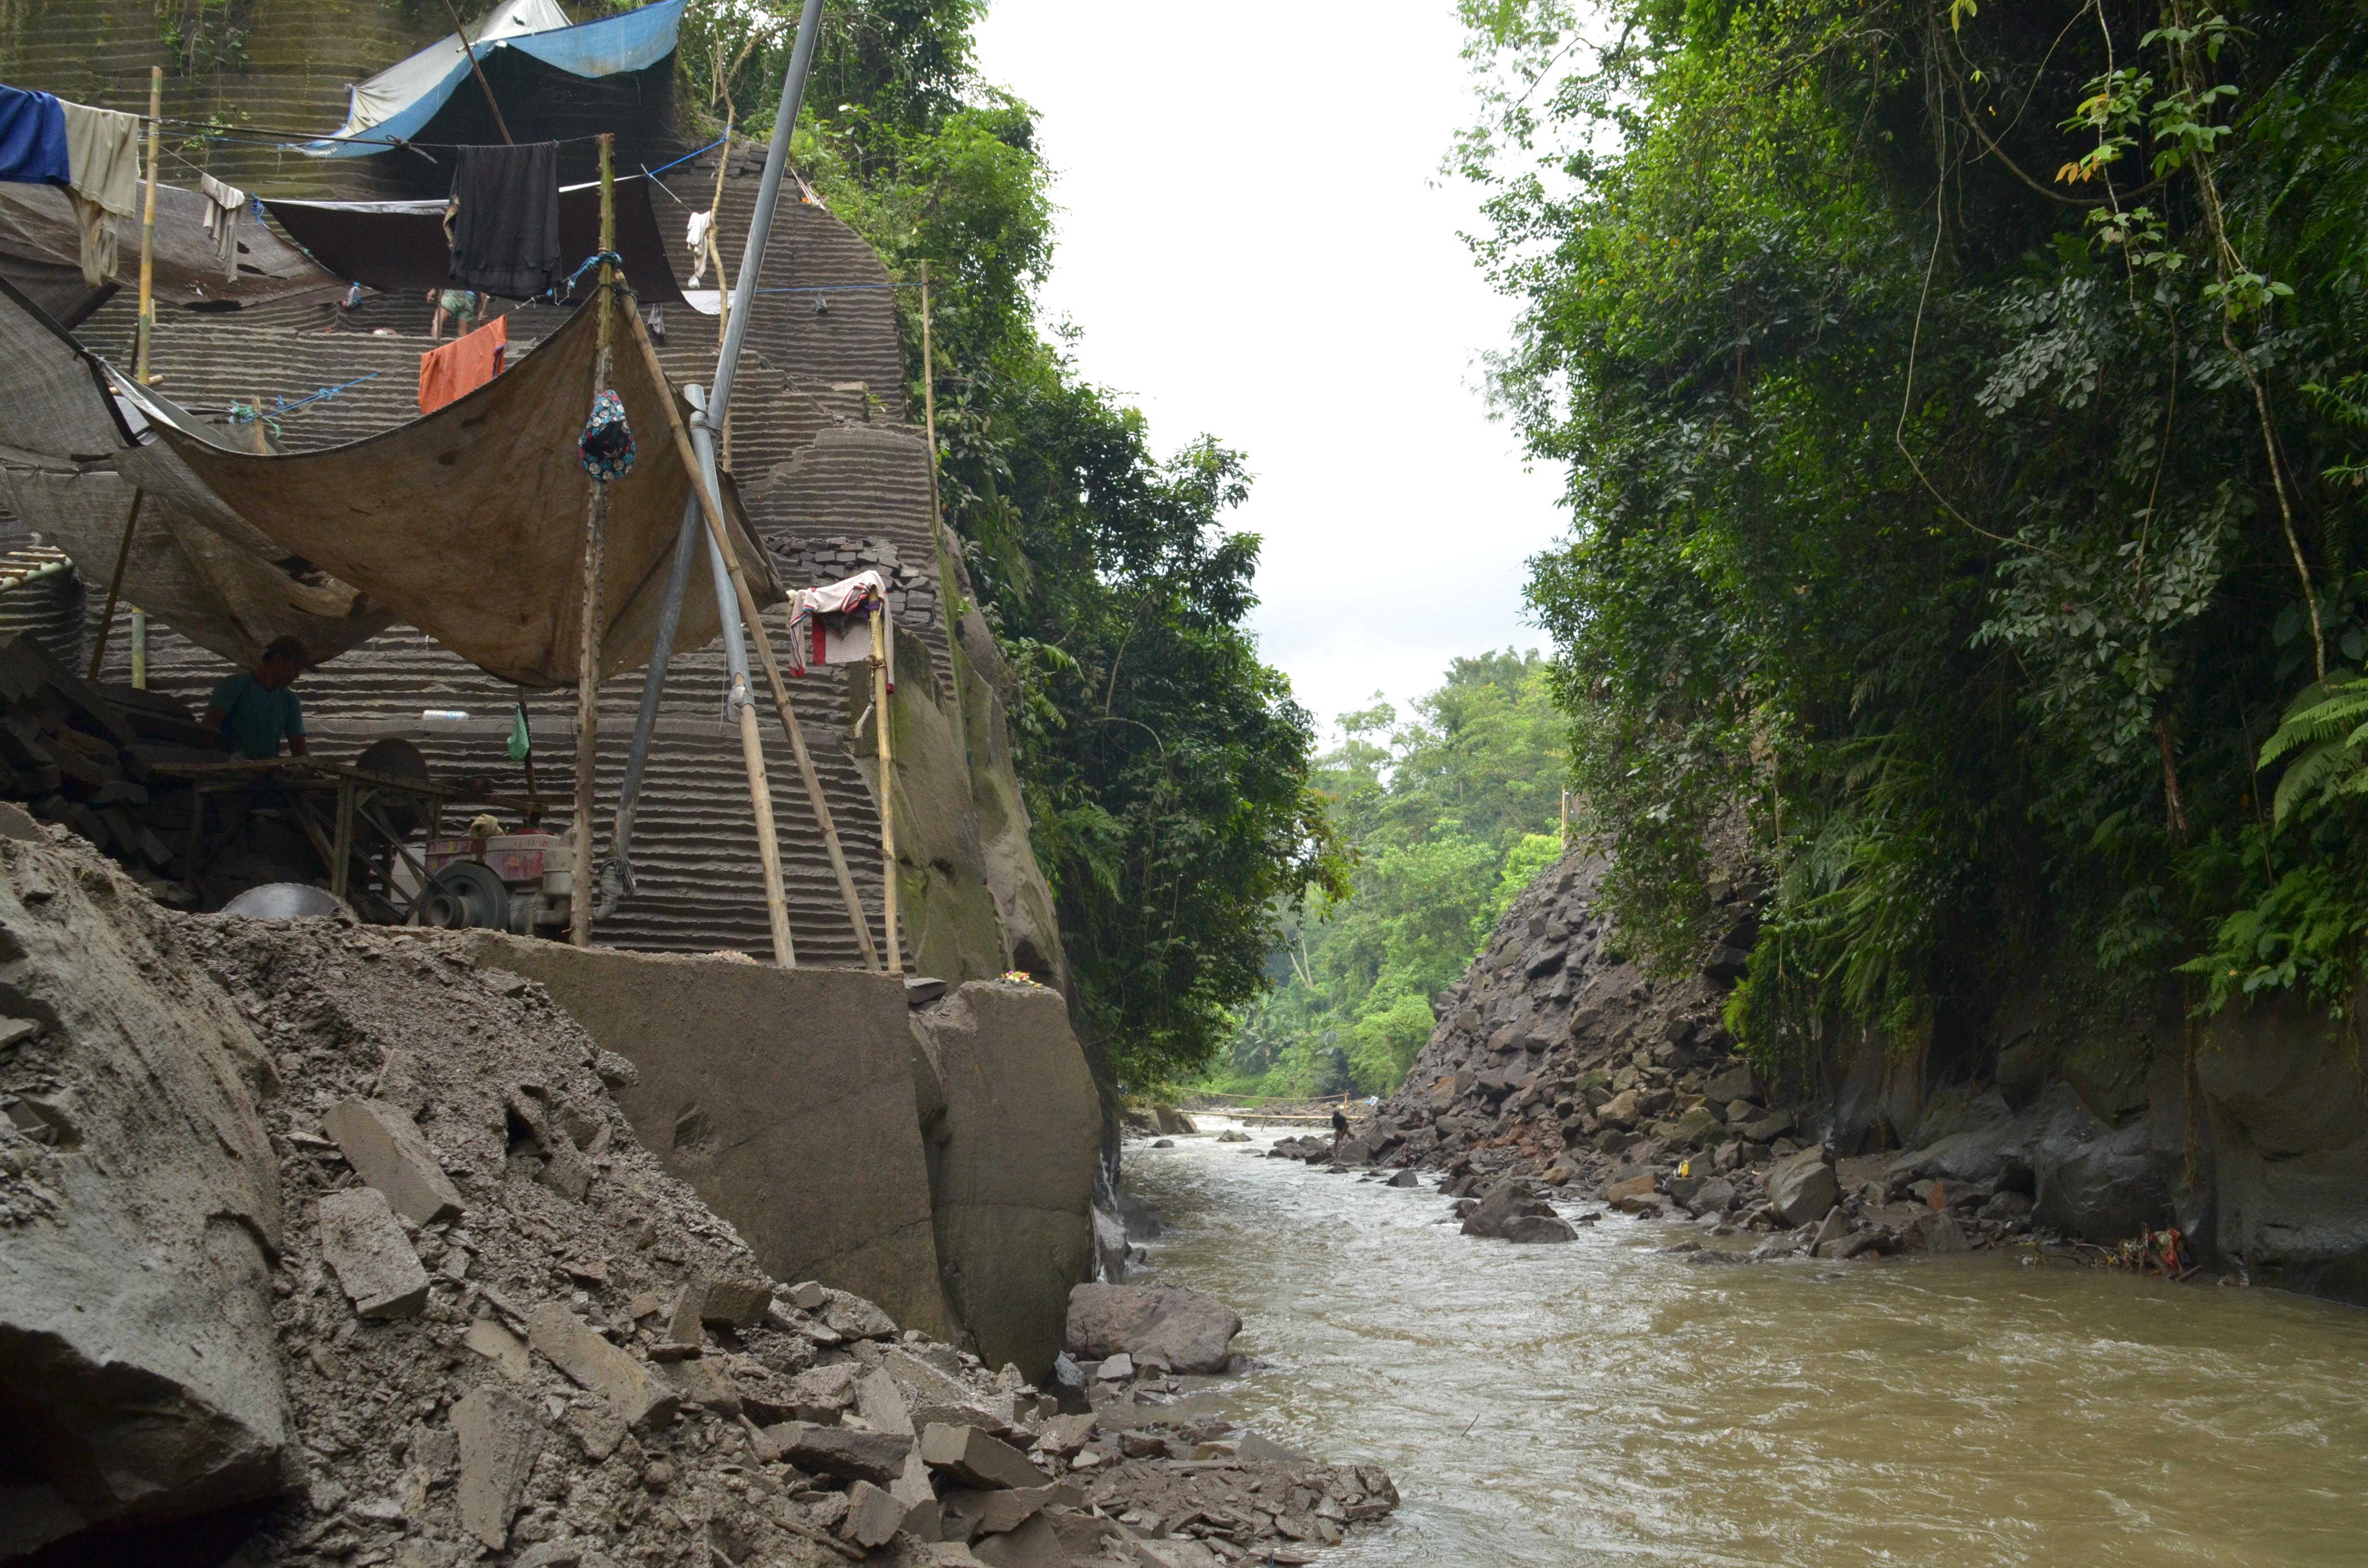 04.03.01_Mining Impacts_006